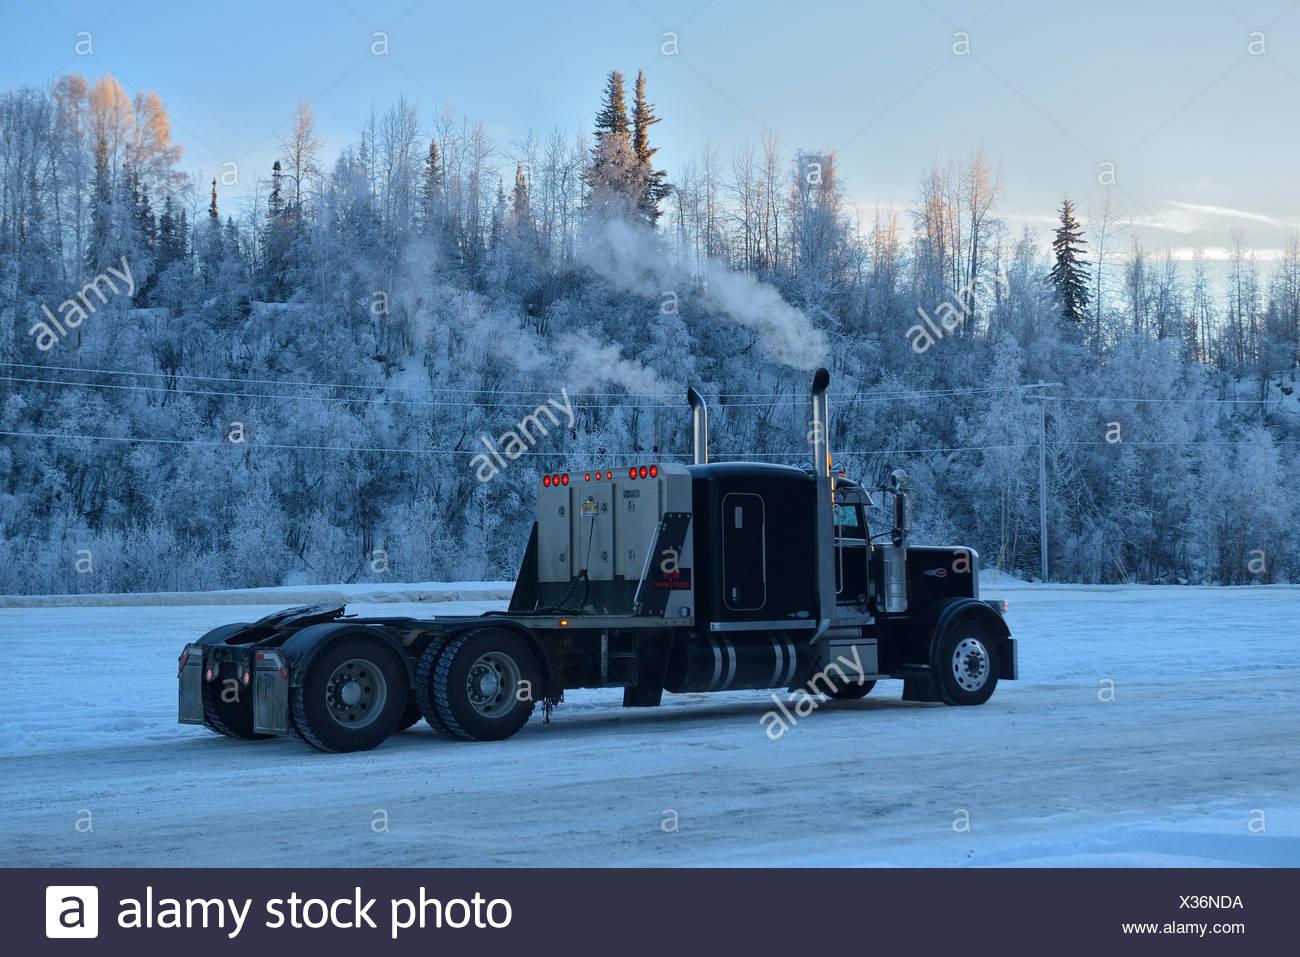 USA, United States, America, Alaska, Fairbanks, truck, winter, trucking, transportation - Stock Image